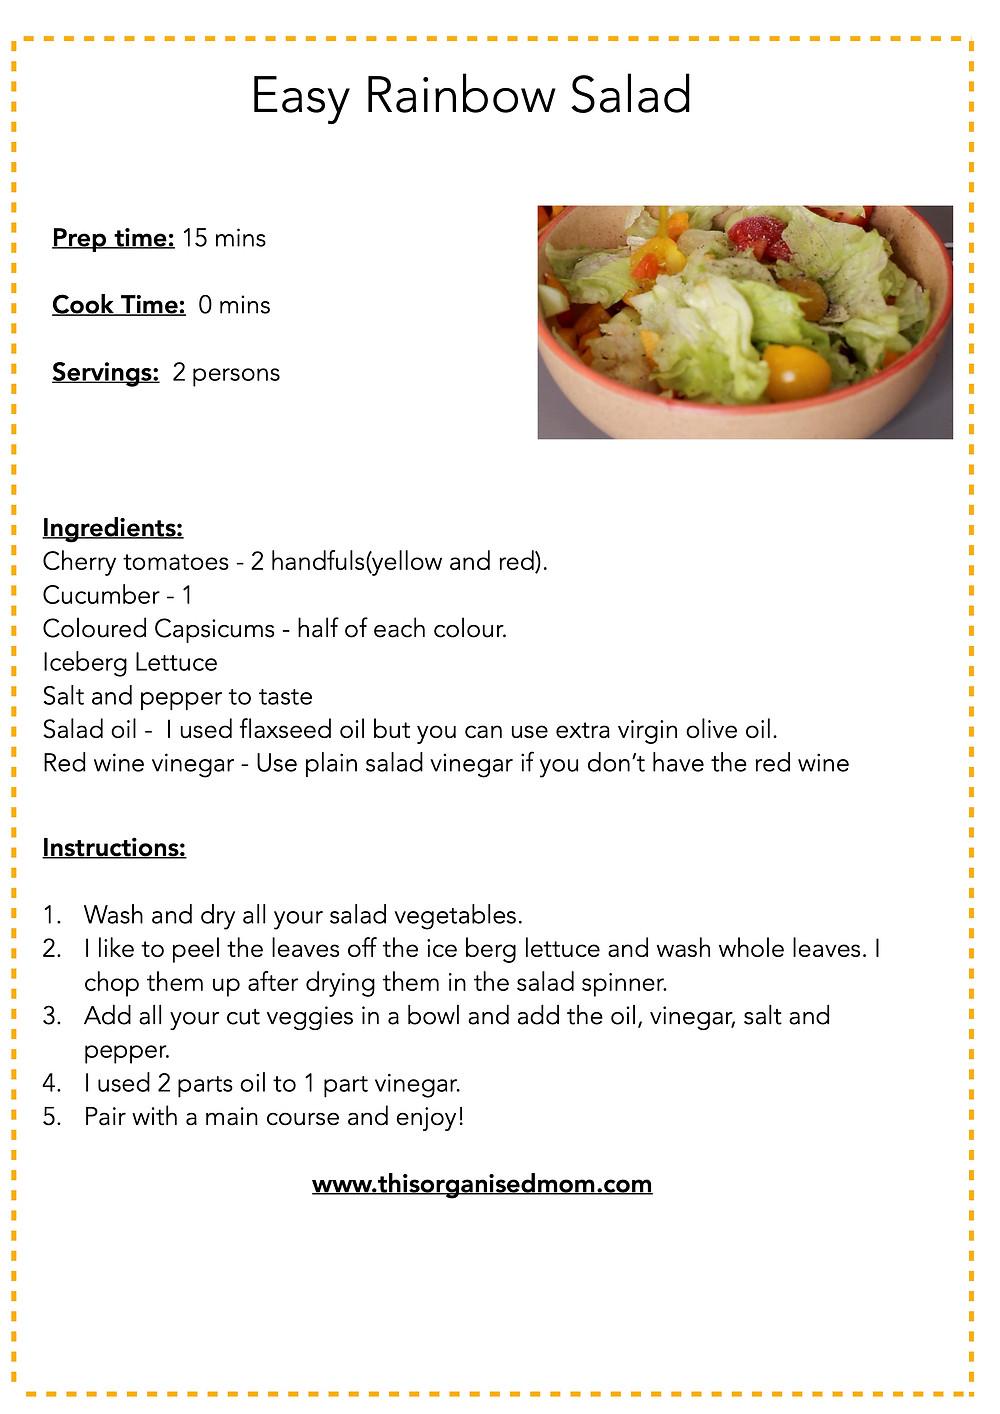 Printable salad recipe